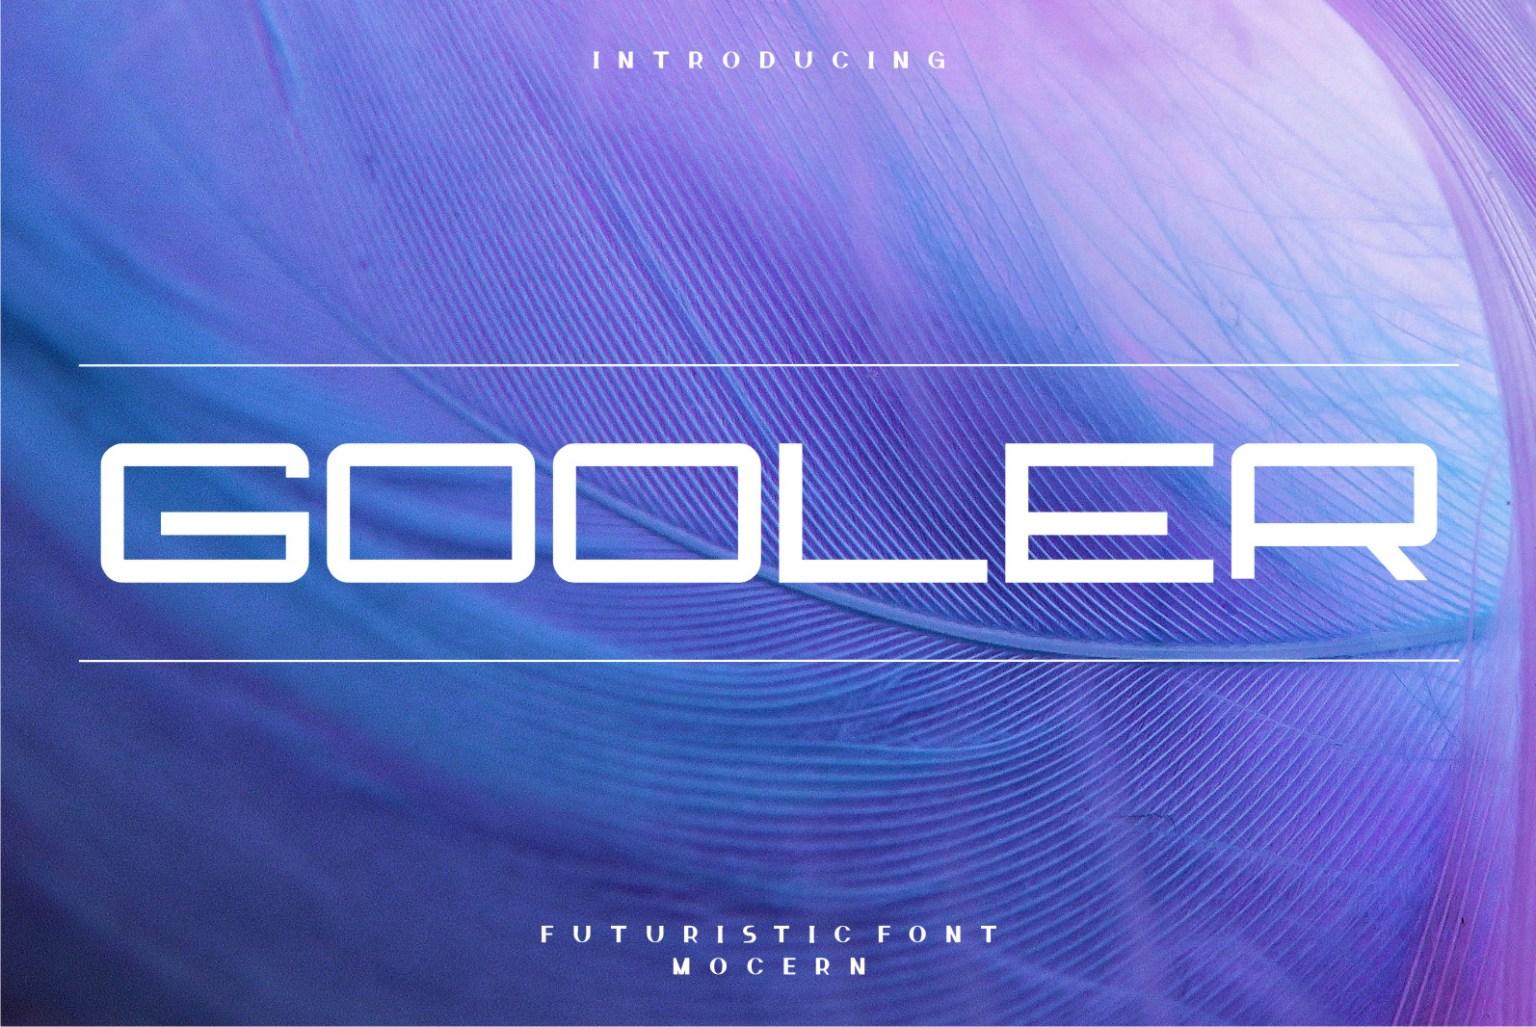 Gooler Display Font